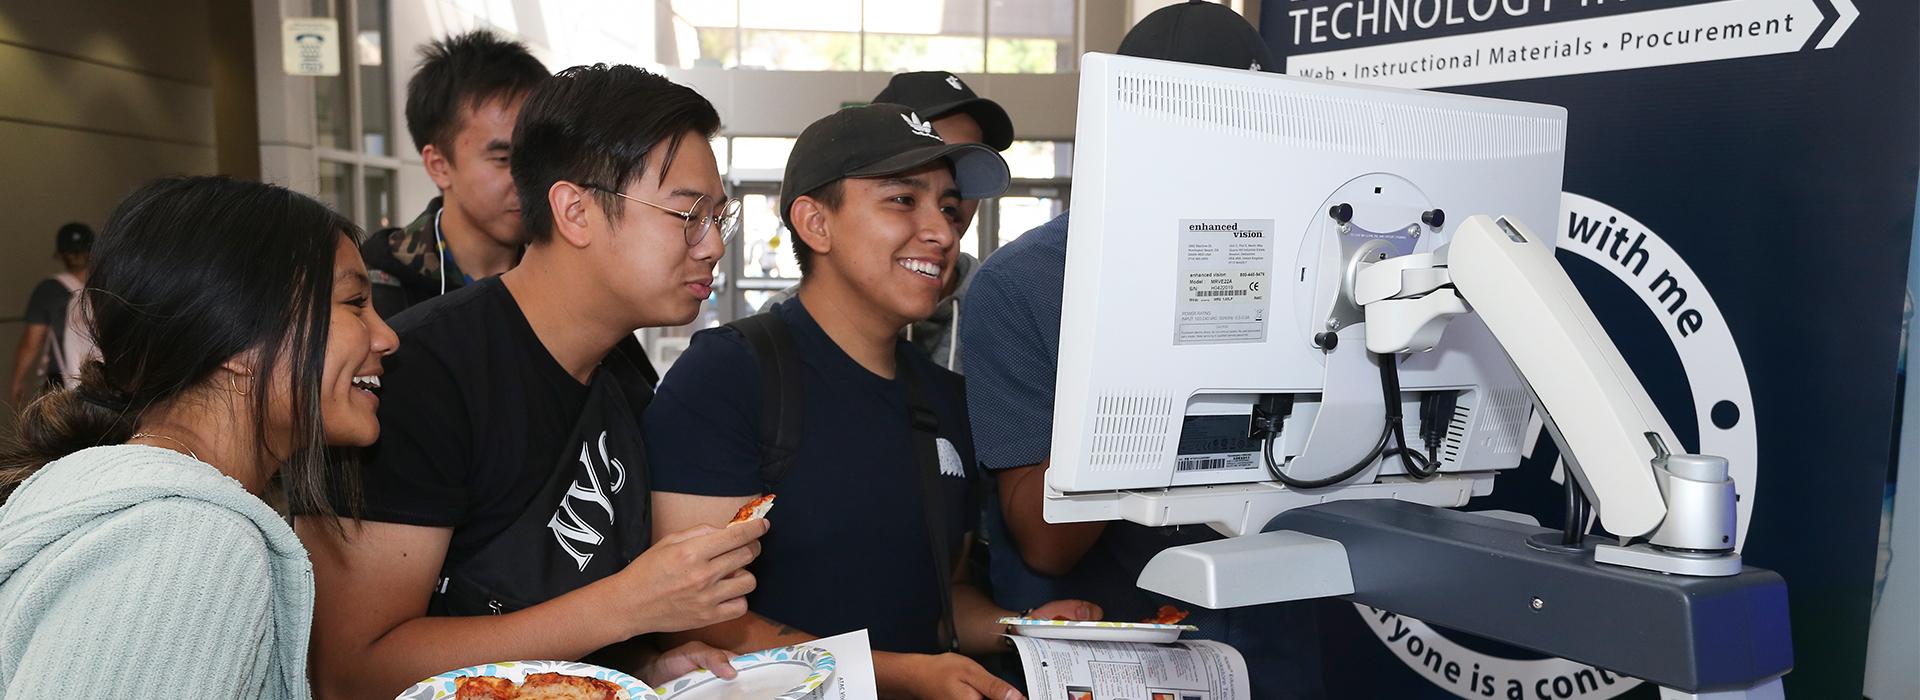 Tech Fest comes to Cal State San Bernardino